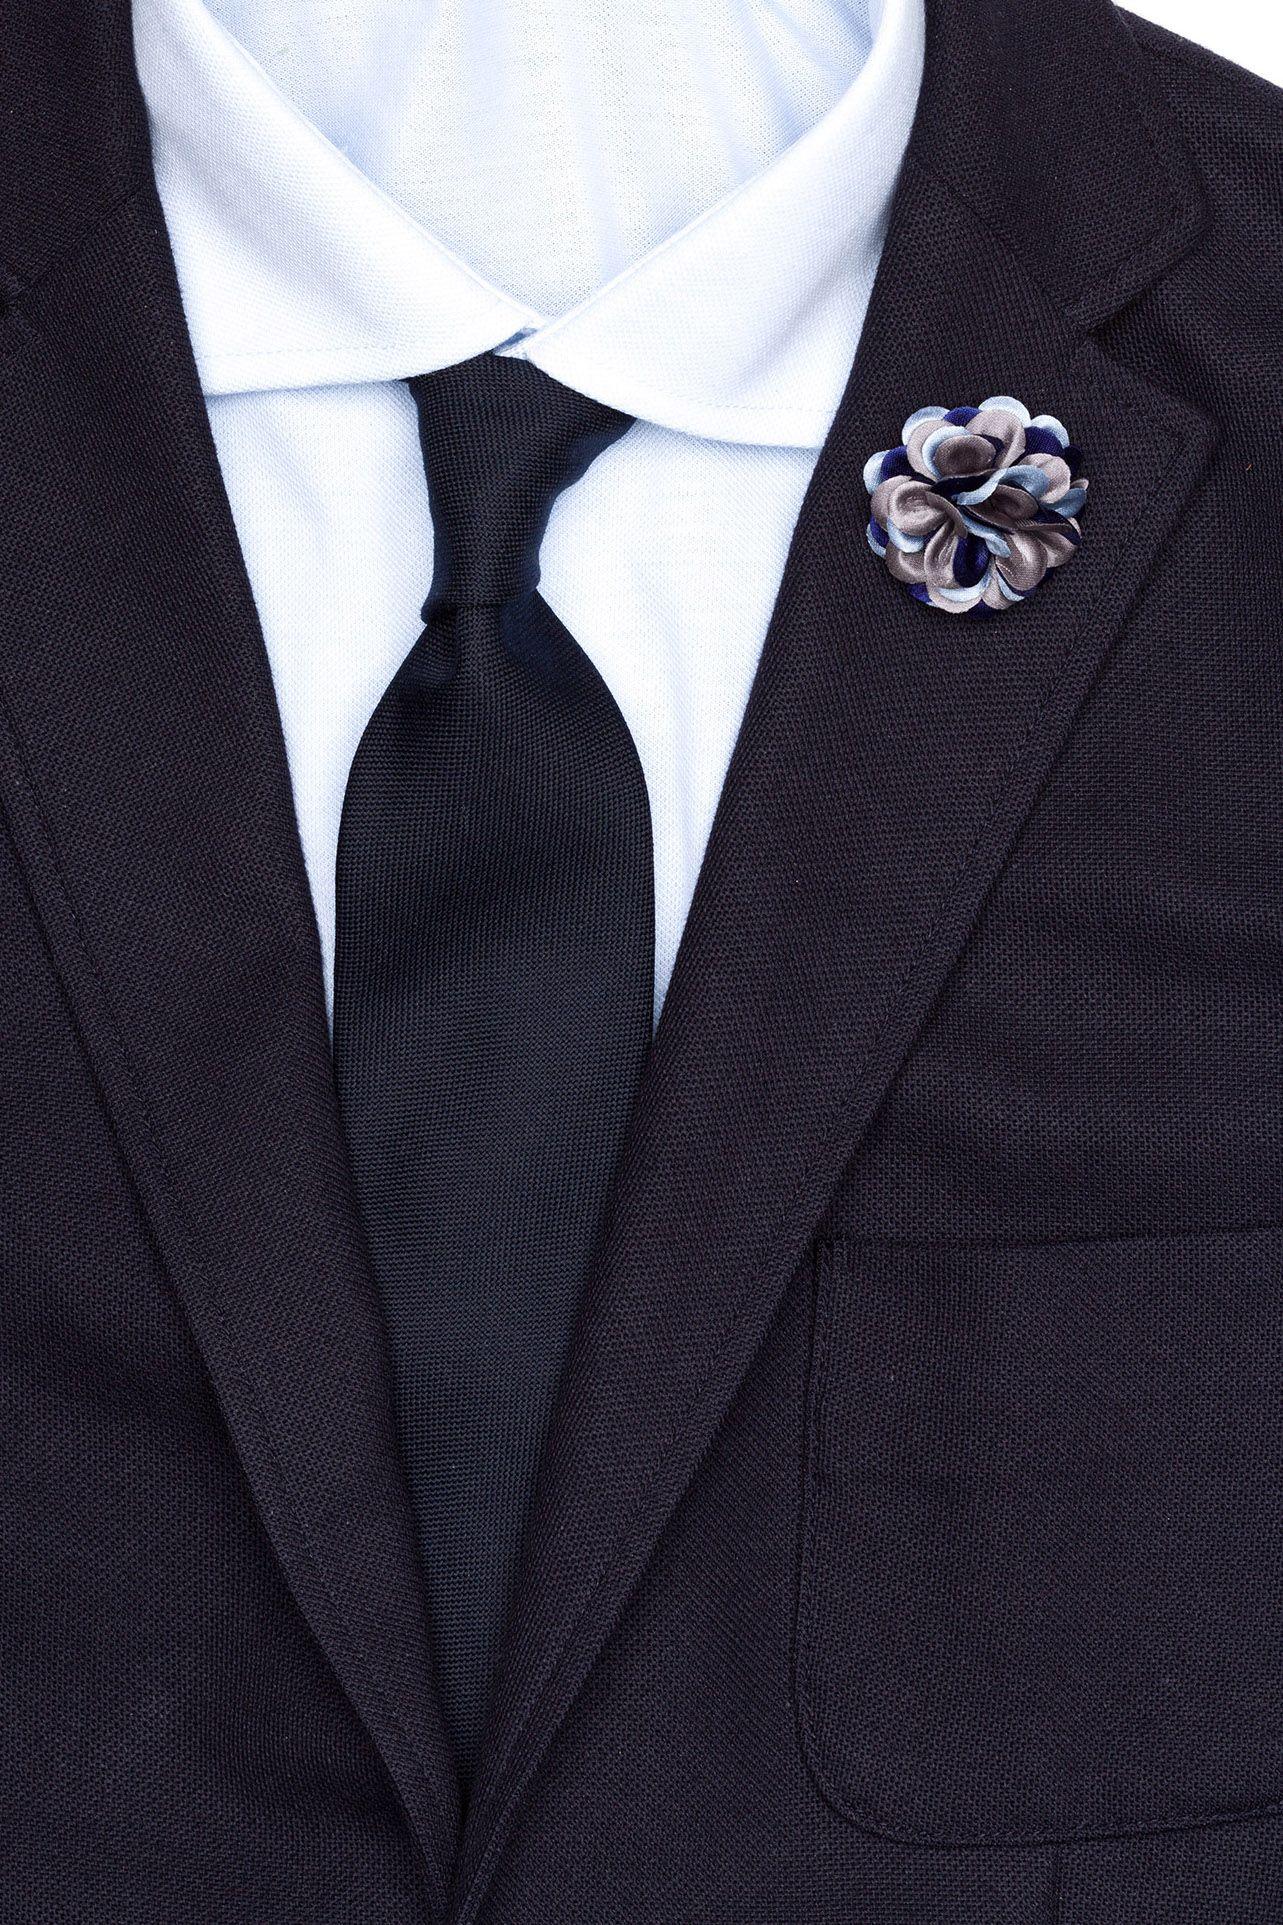 Lapel Flower at hook + ALBERT in grape jam, blue star, dodge, siena, birch, firemouth, hunter, firebrick, gainsboro, steel blue, gardenia, jonquil, fern, orchid, aster, pronie, spruce, rhododendron